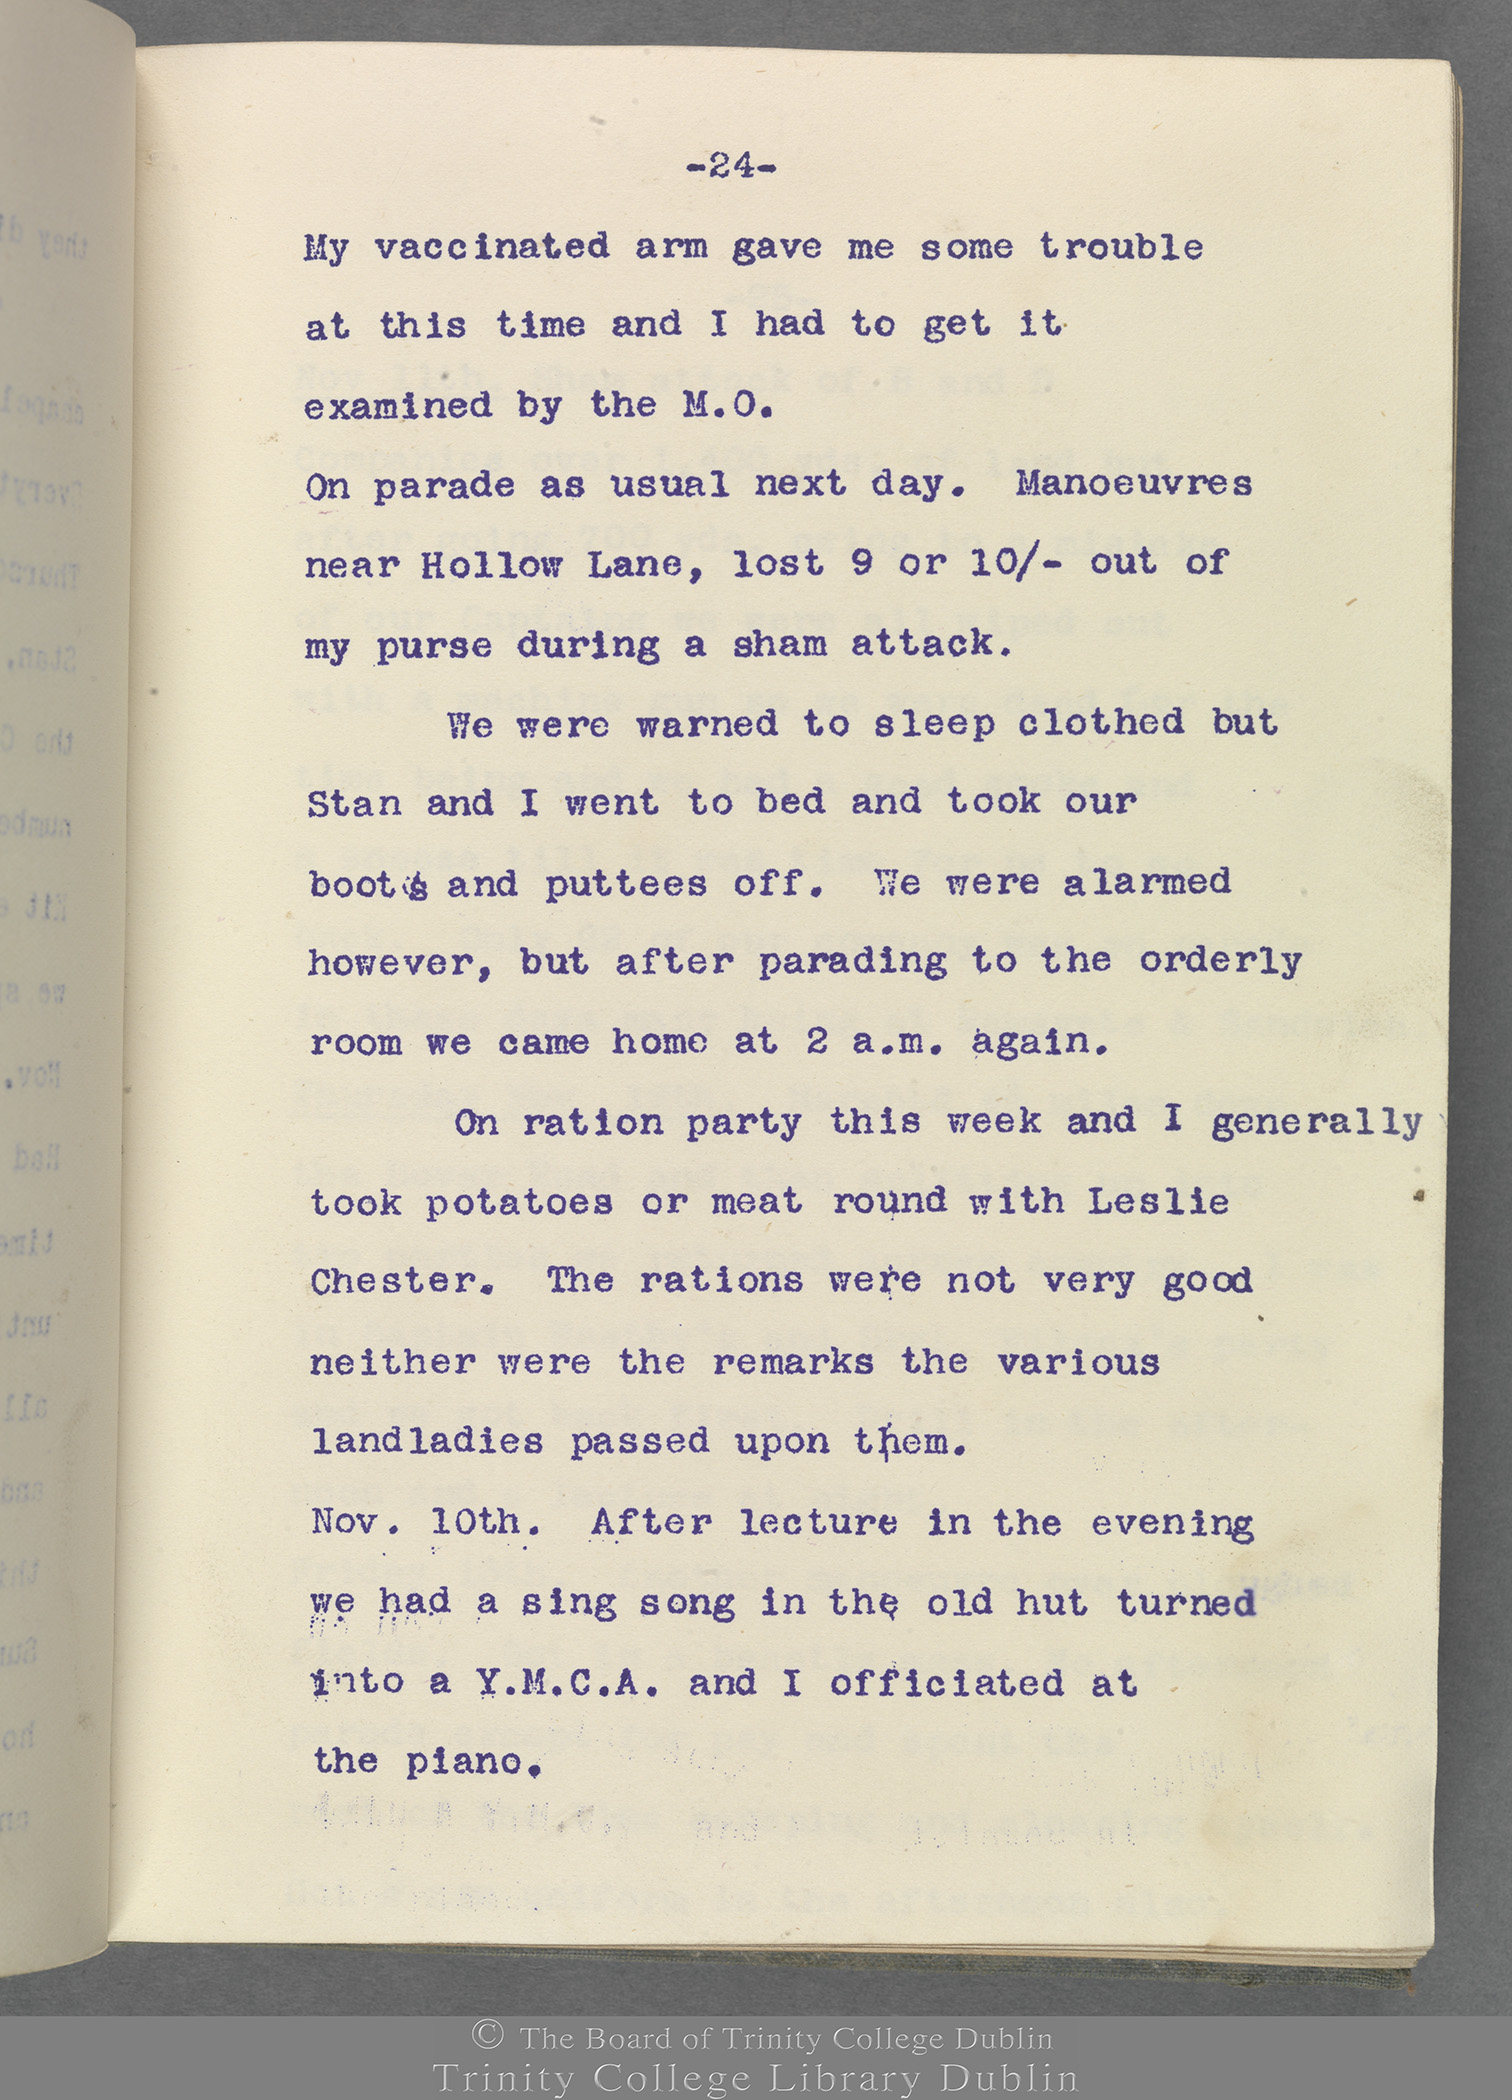 TCD MS 10853 folio 24 recto